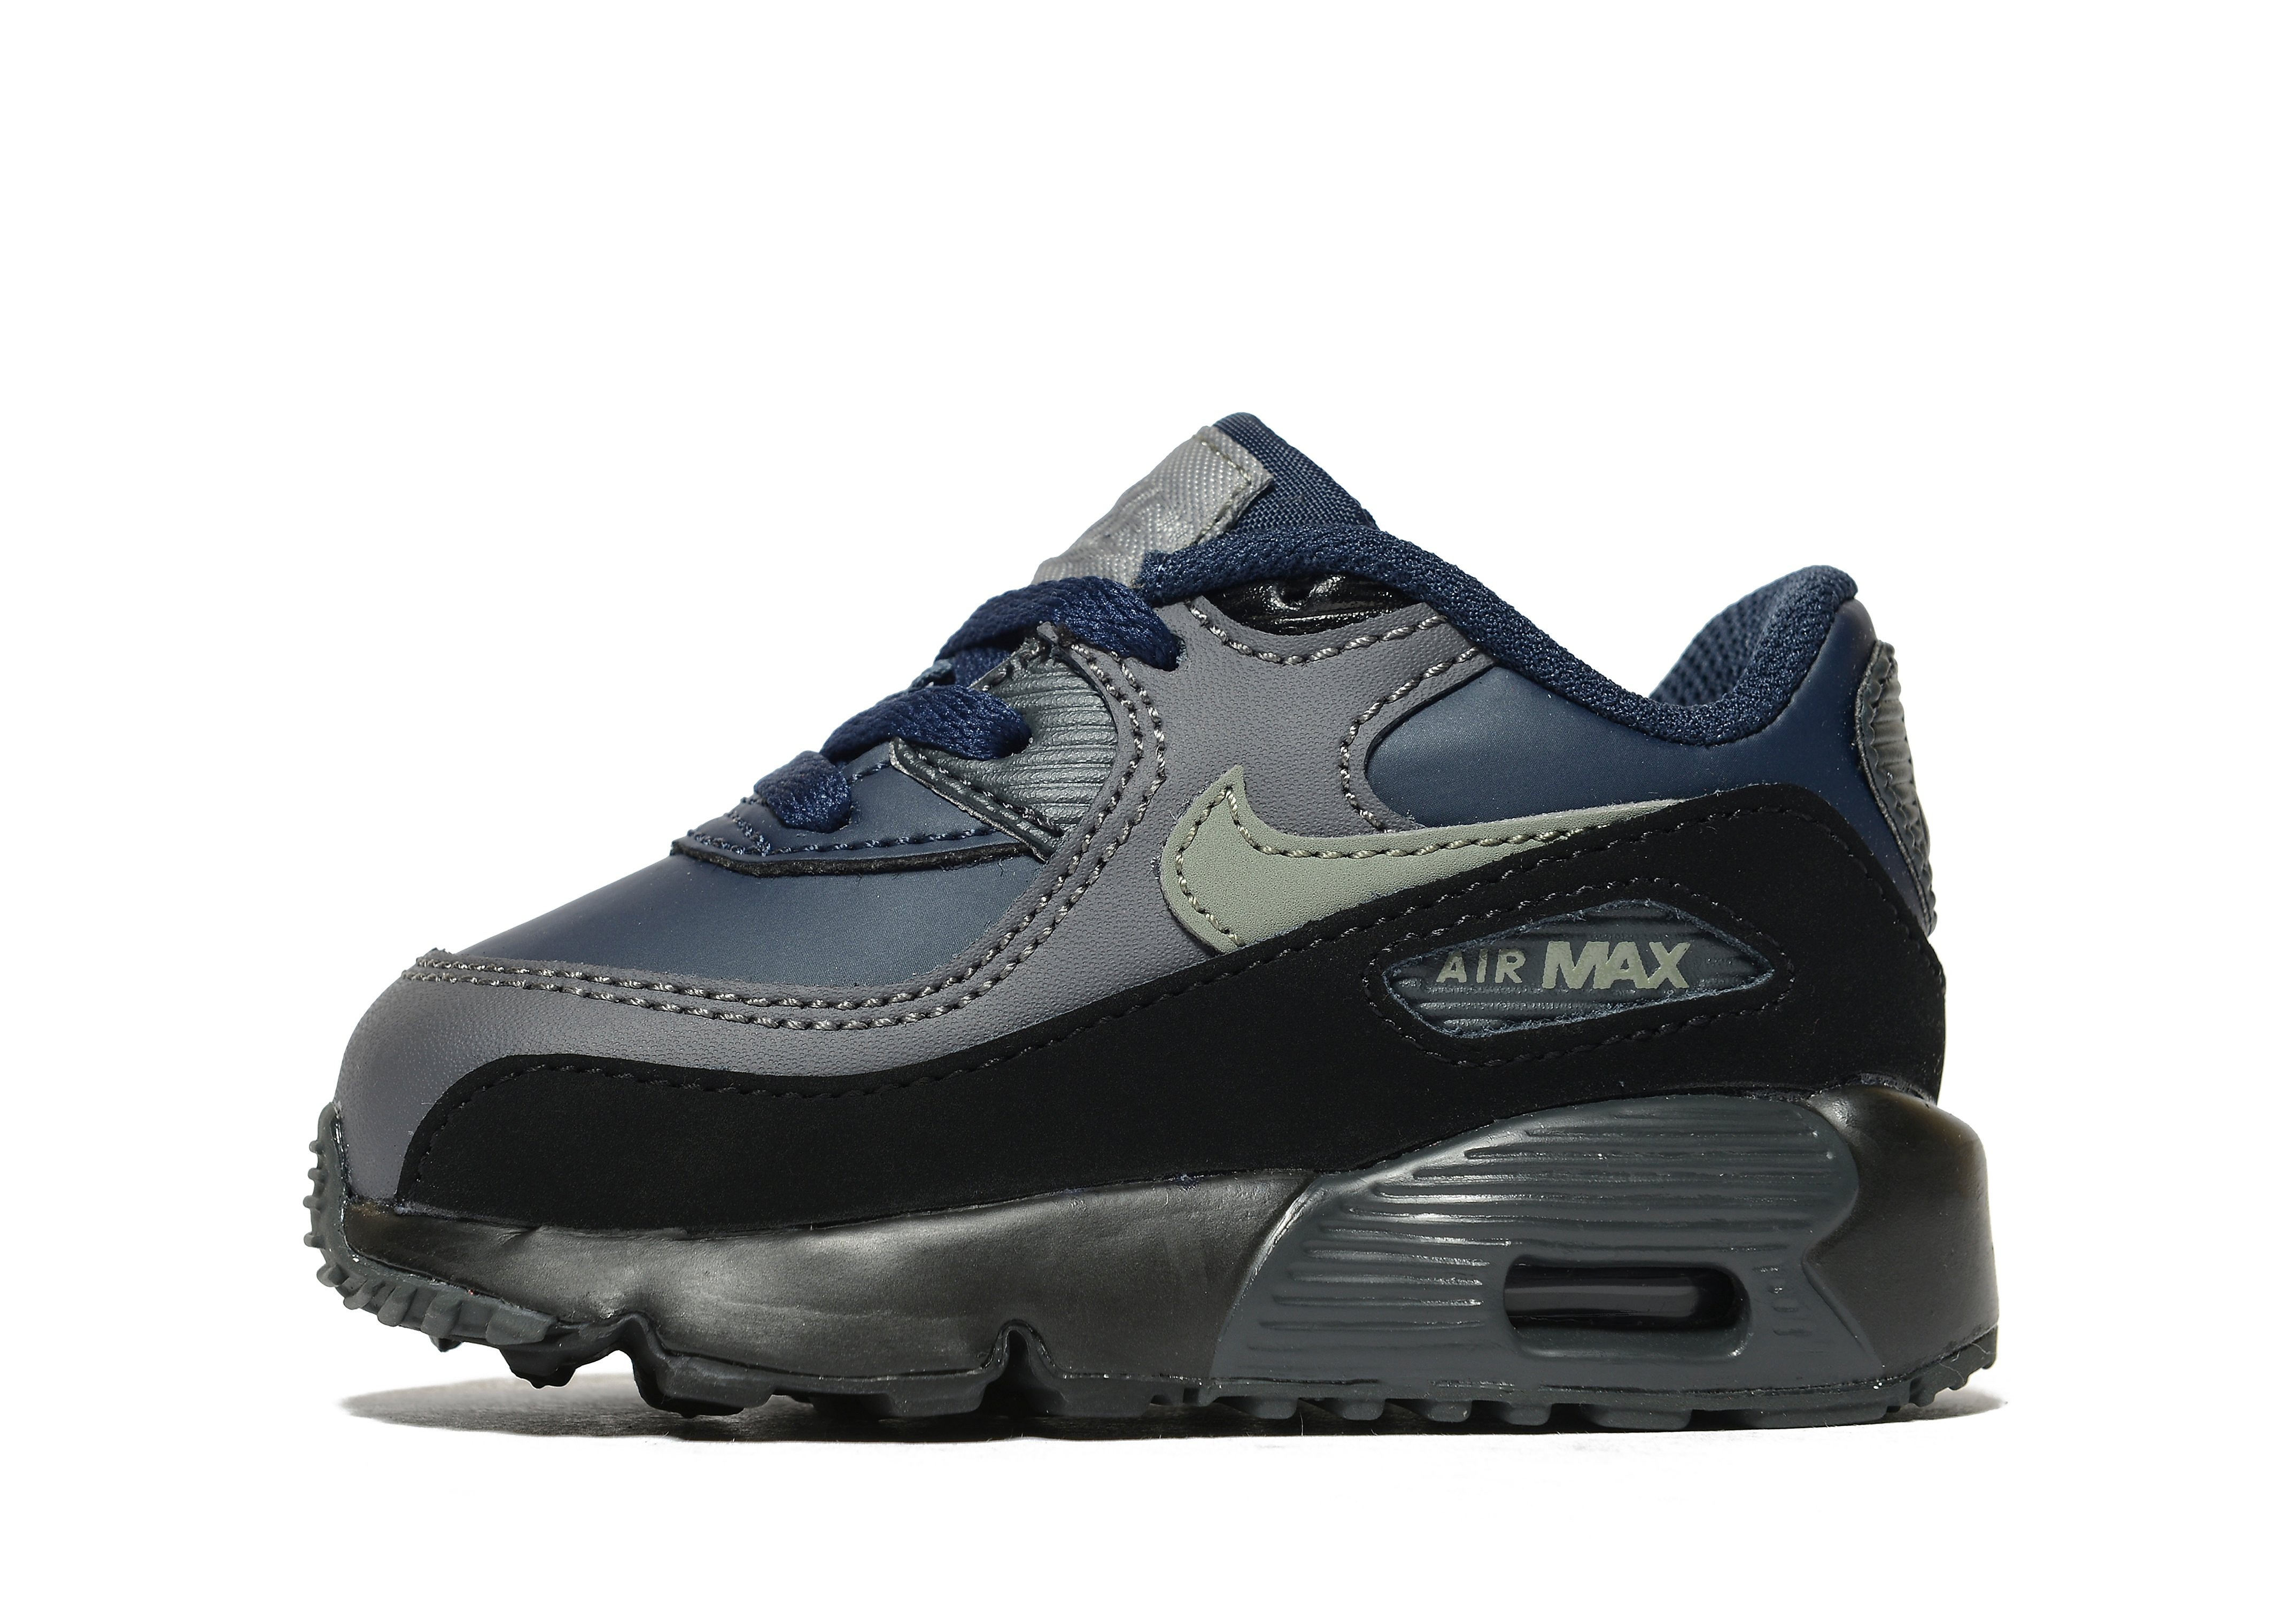 Nike Air Max 90 Säuglinge